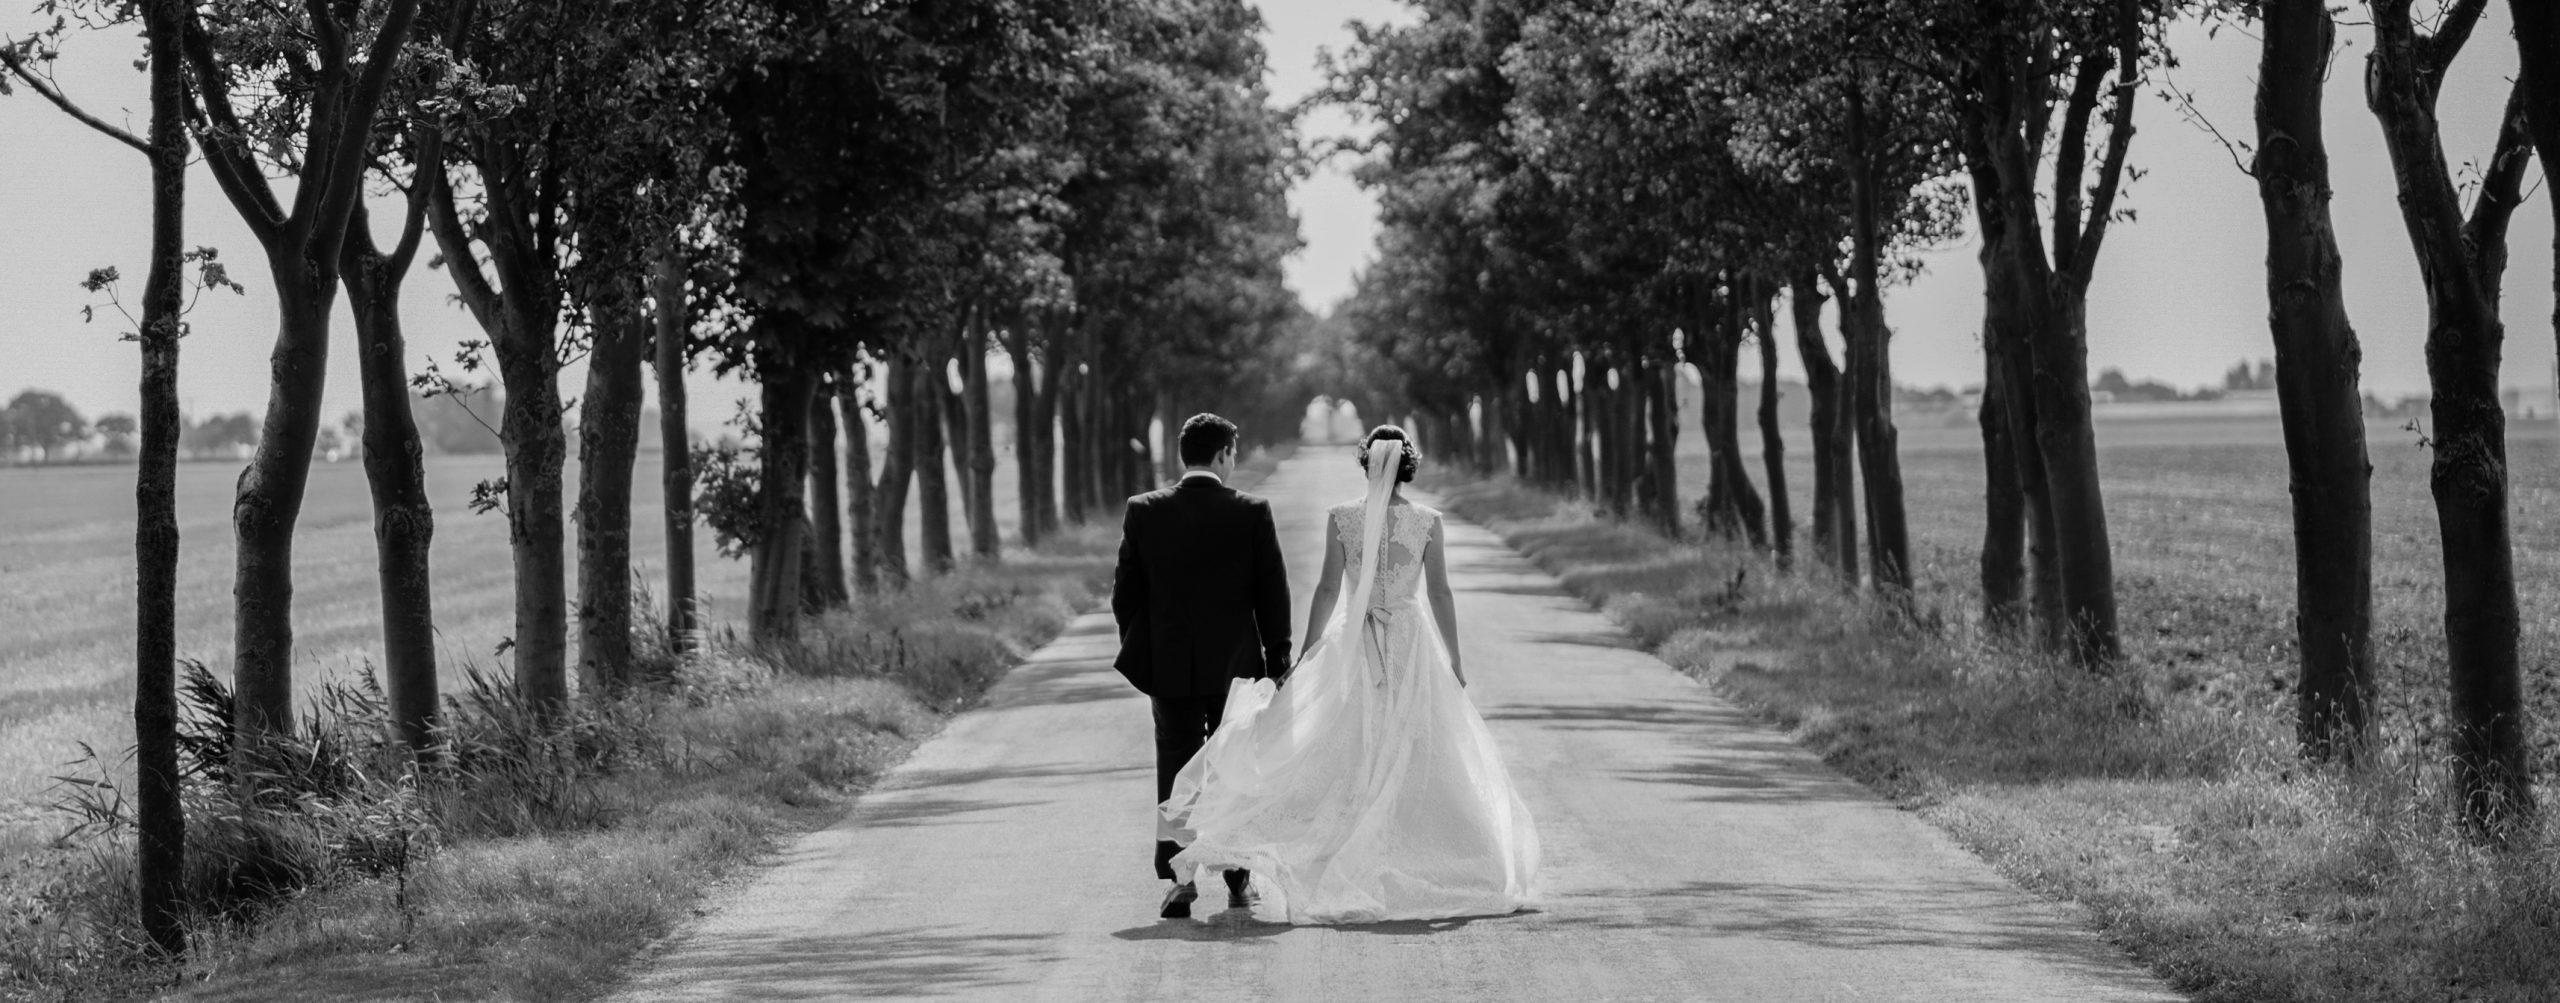 East Yorkshire Wedding Photographer 2